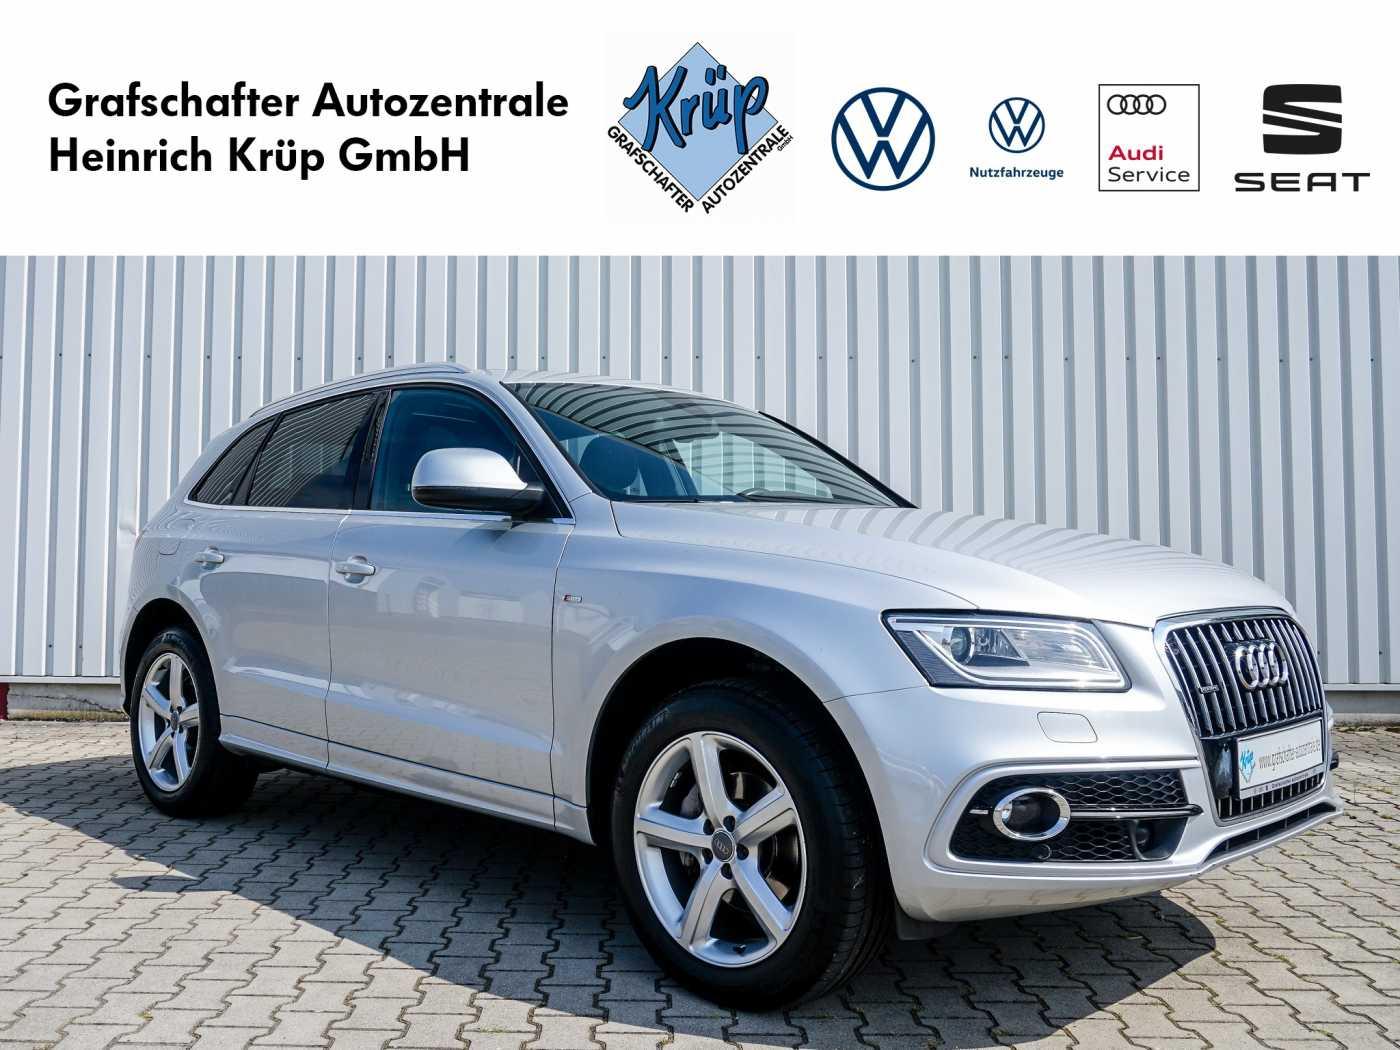 Audi Q5 2.0 TDI quattro S tronic *S Line*Pano*STHZ*, Jahr 2013, Diesel